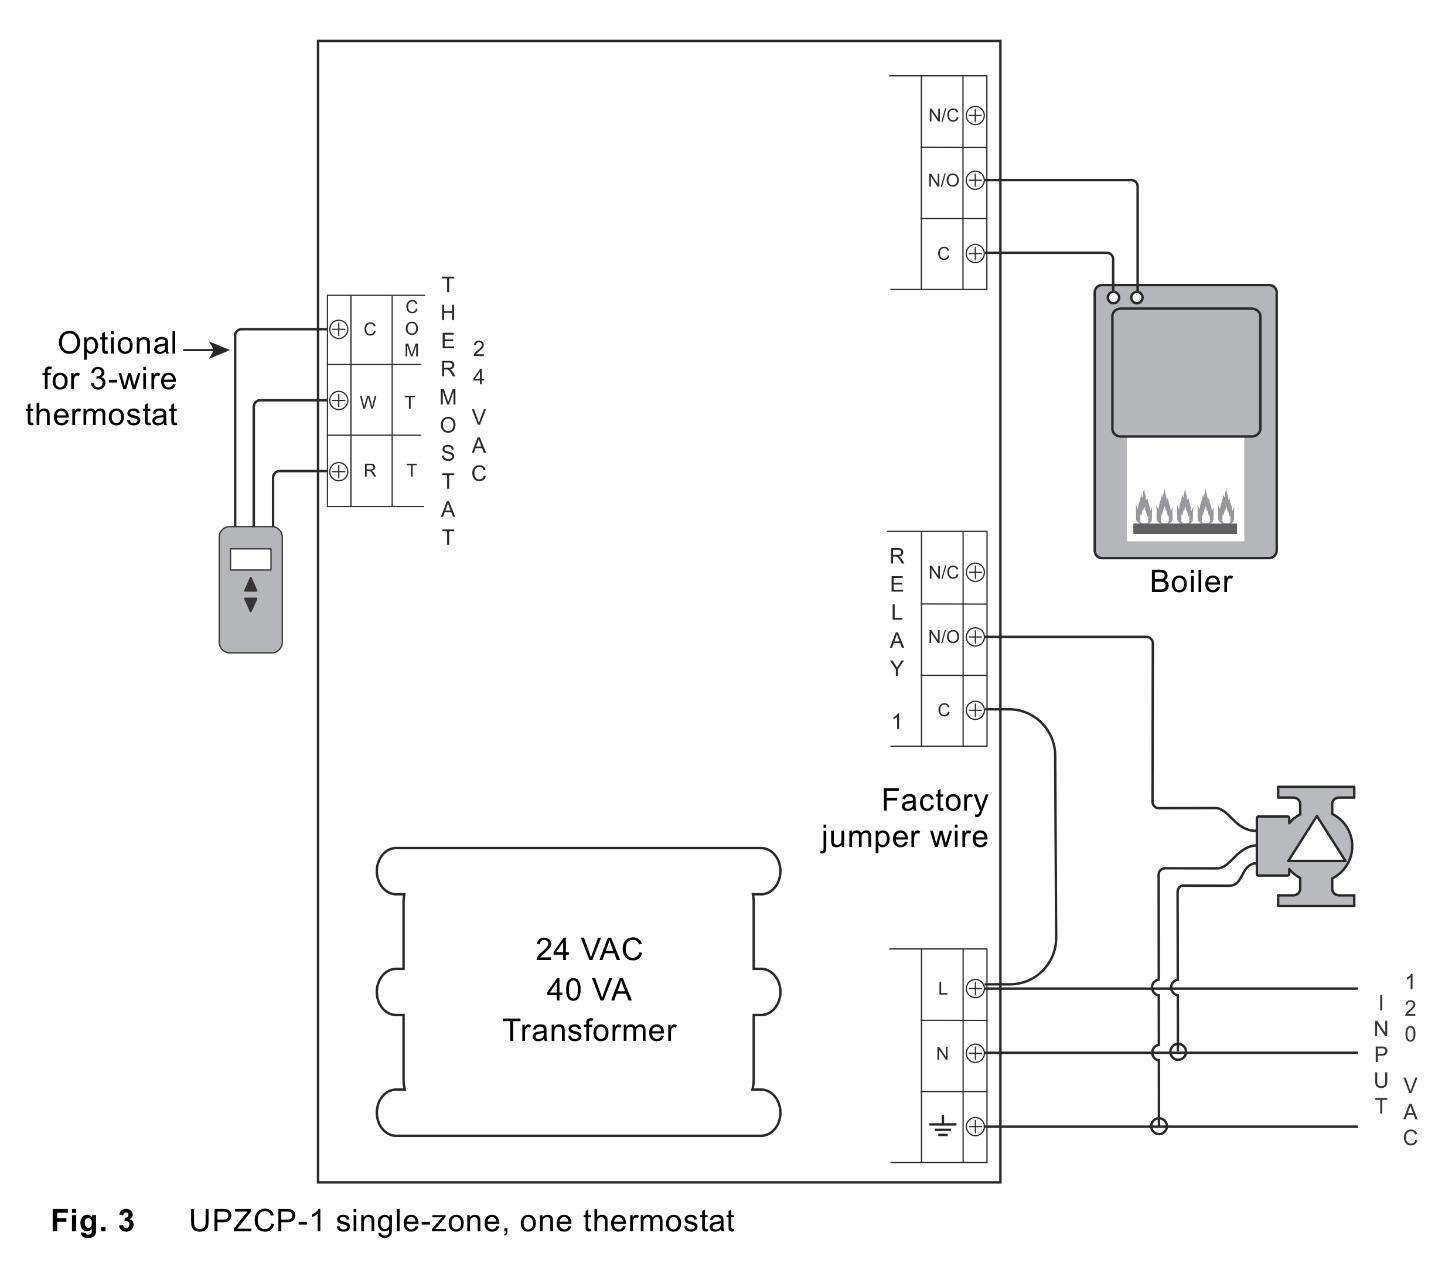 grundfos booster pump wiring diagram atwood water heater circulating free